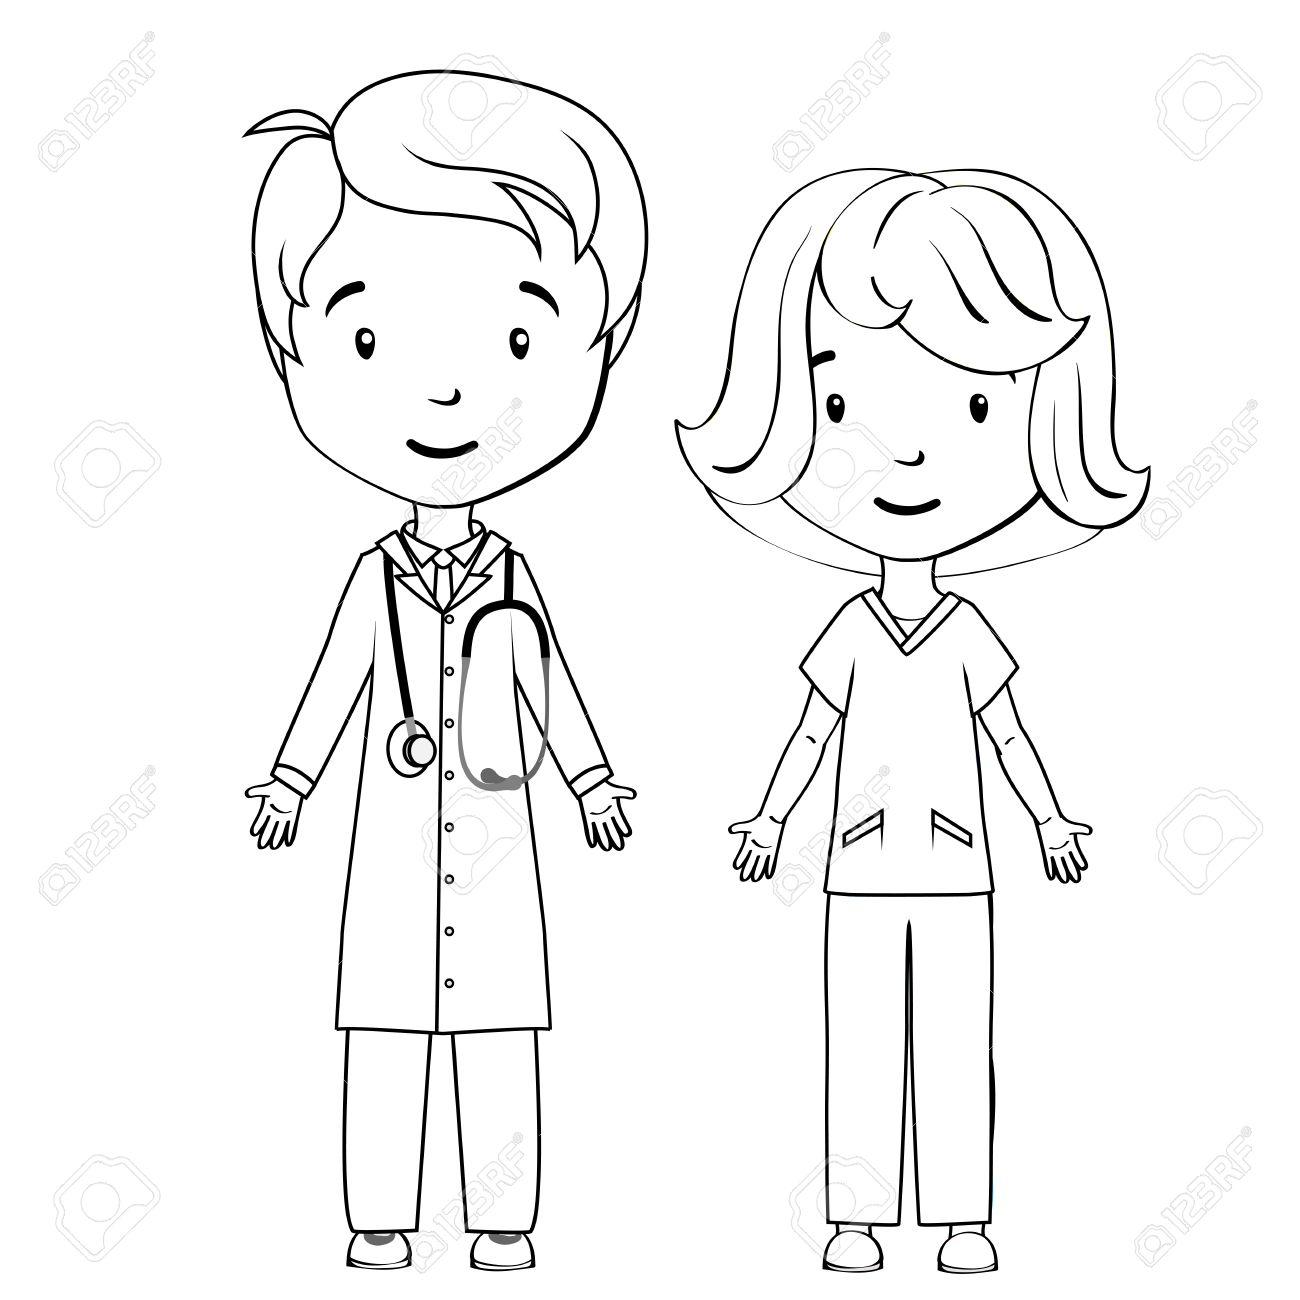 Coloring Book: Cartoon Doctor And Nurse Royalty Free Cliparts ...